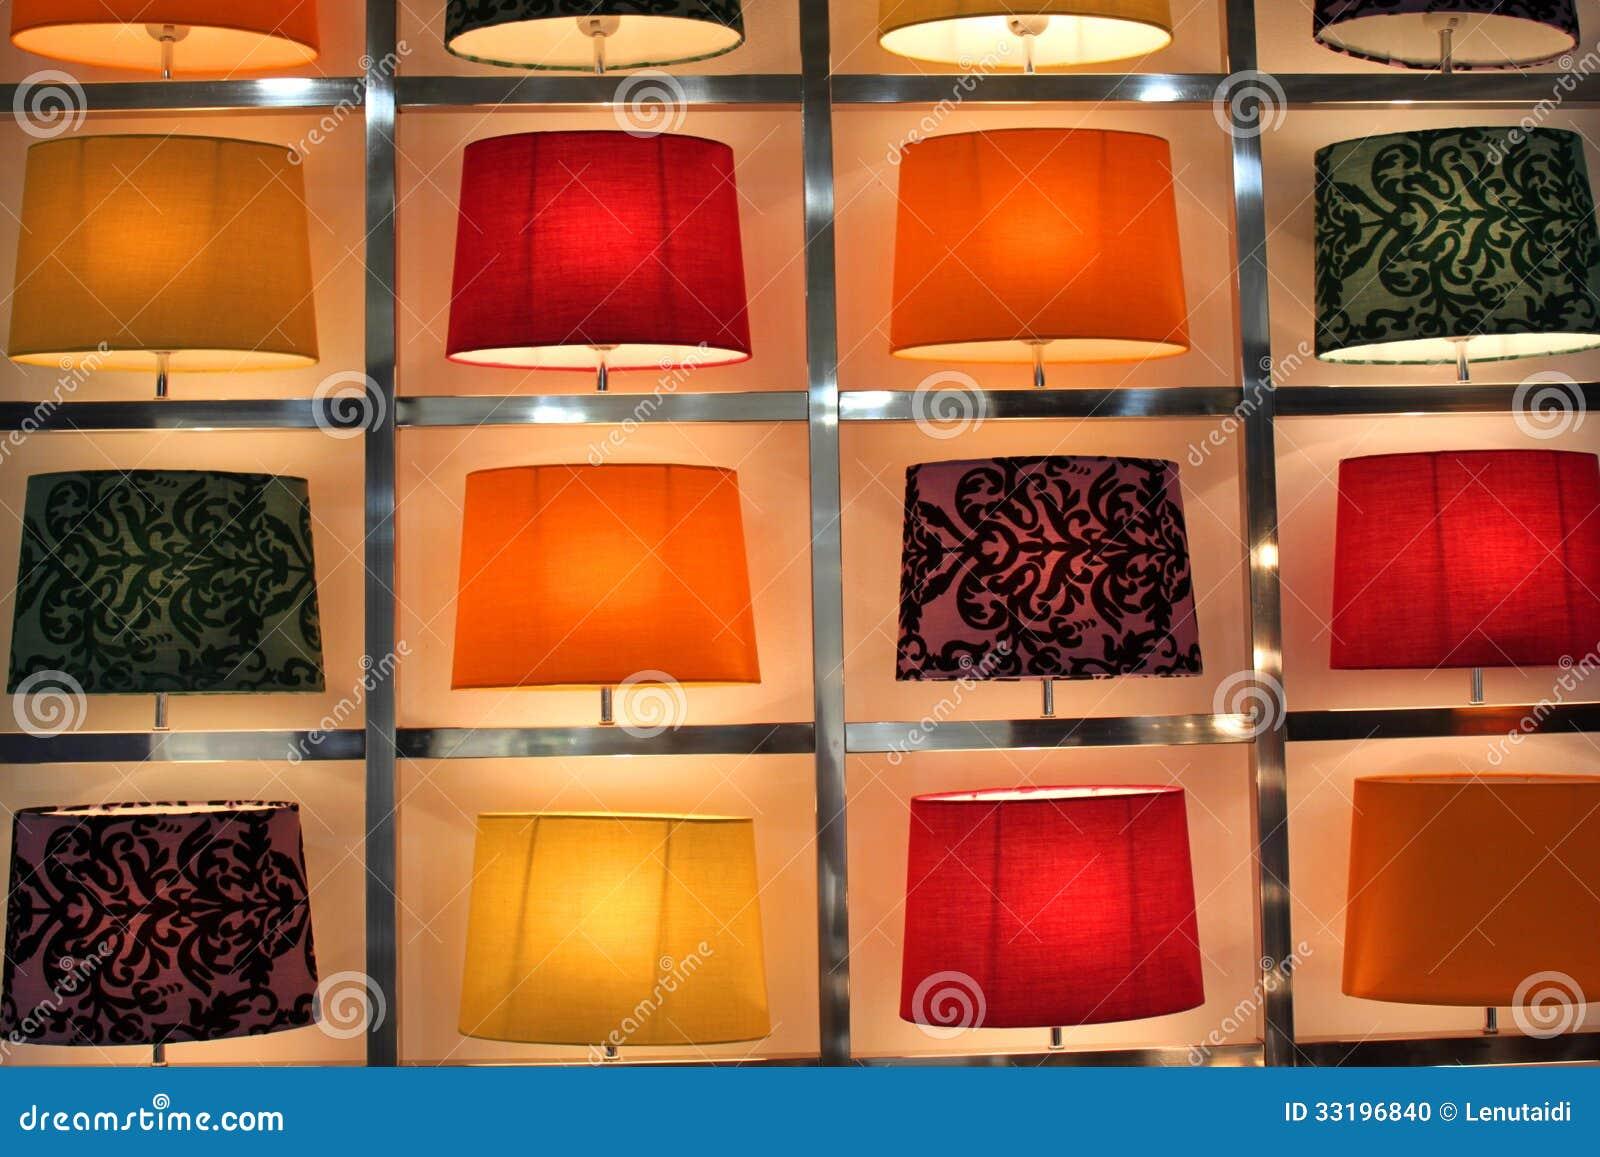 Lampade Da Tavolo Moderne Colorate.Insieme Delle Lampade Da Tavolo Moderne Fotografia Stock